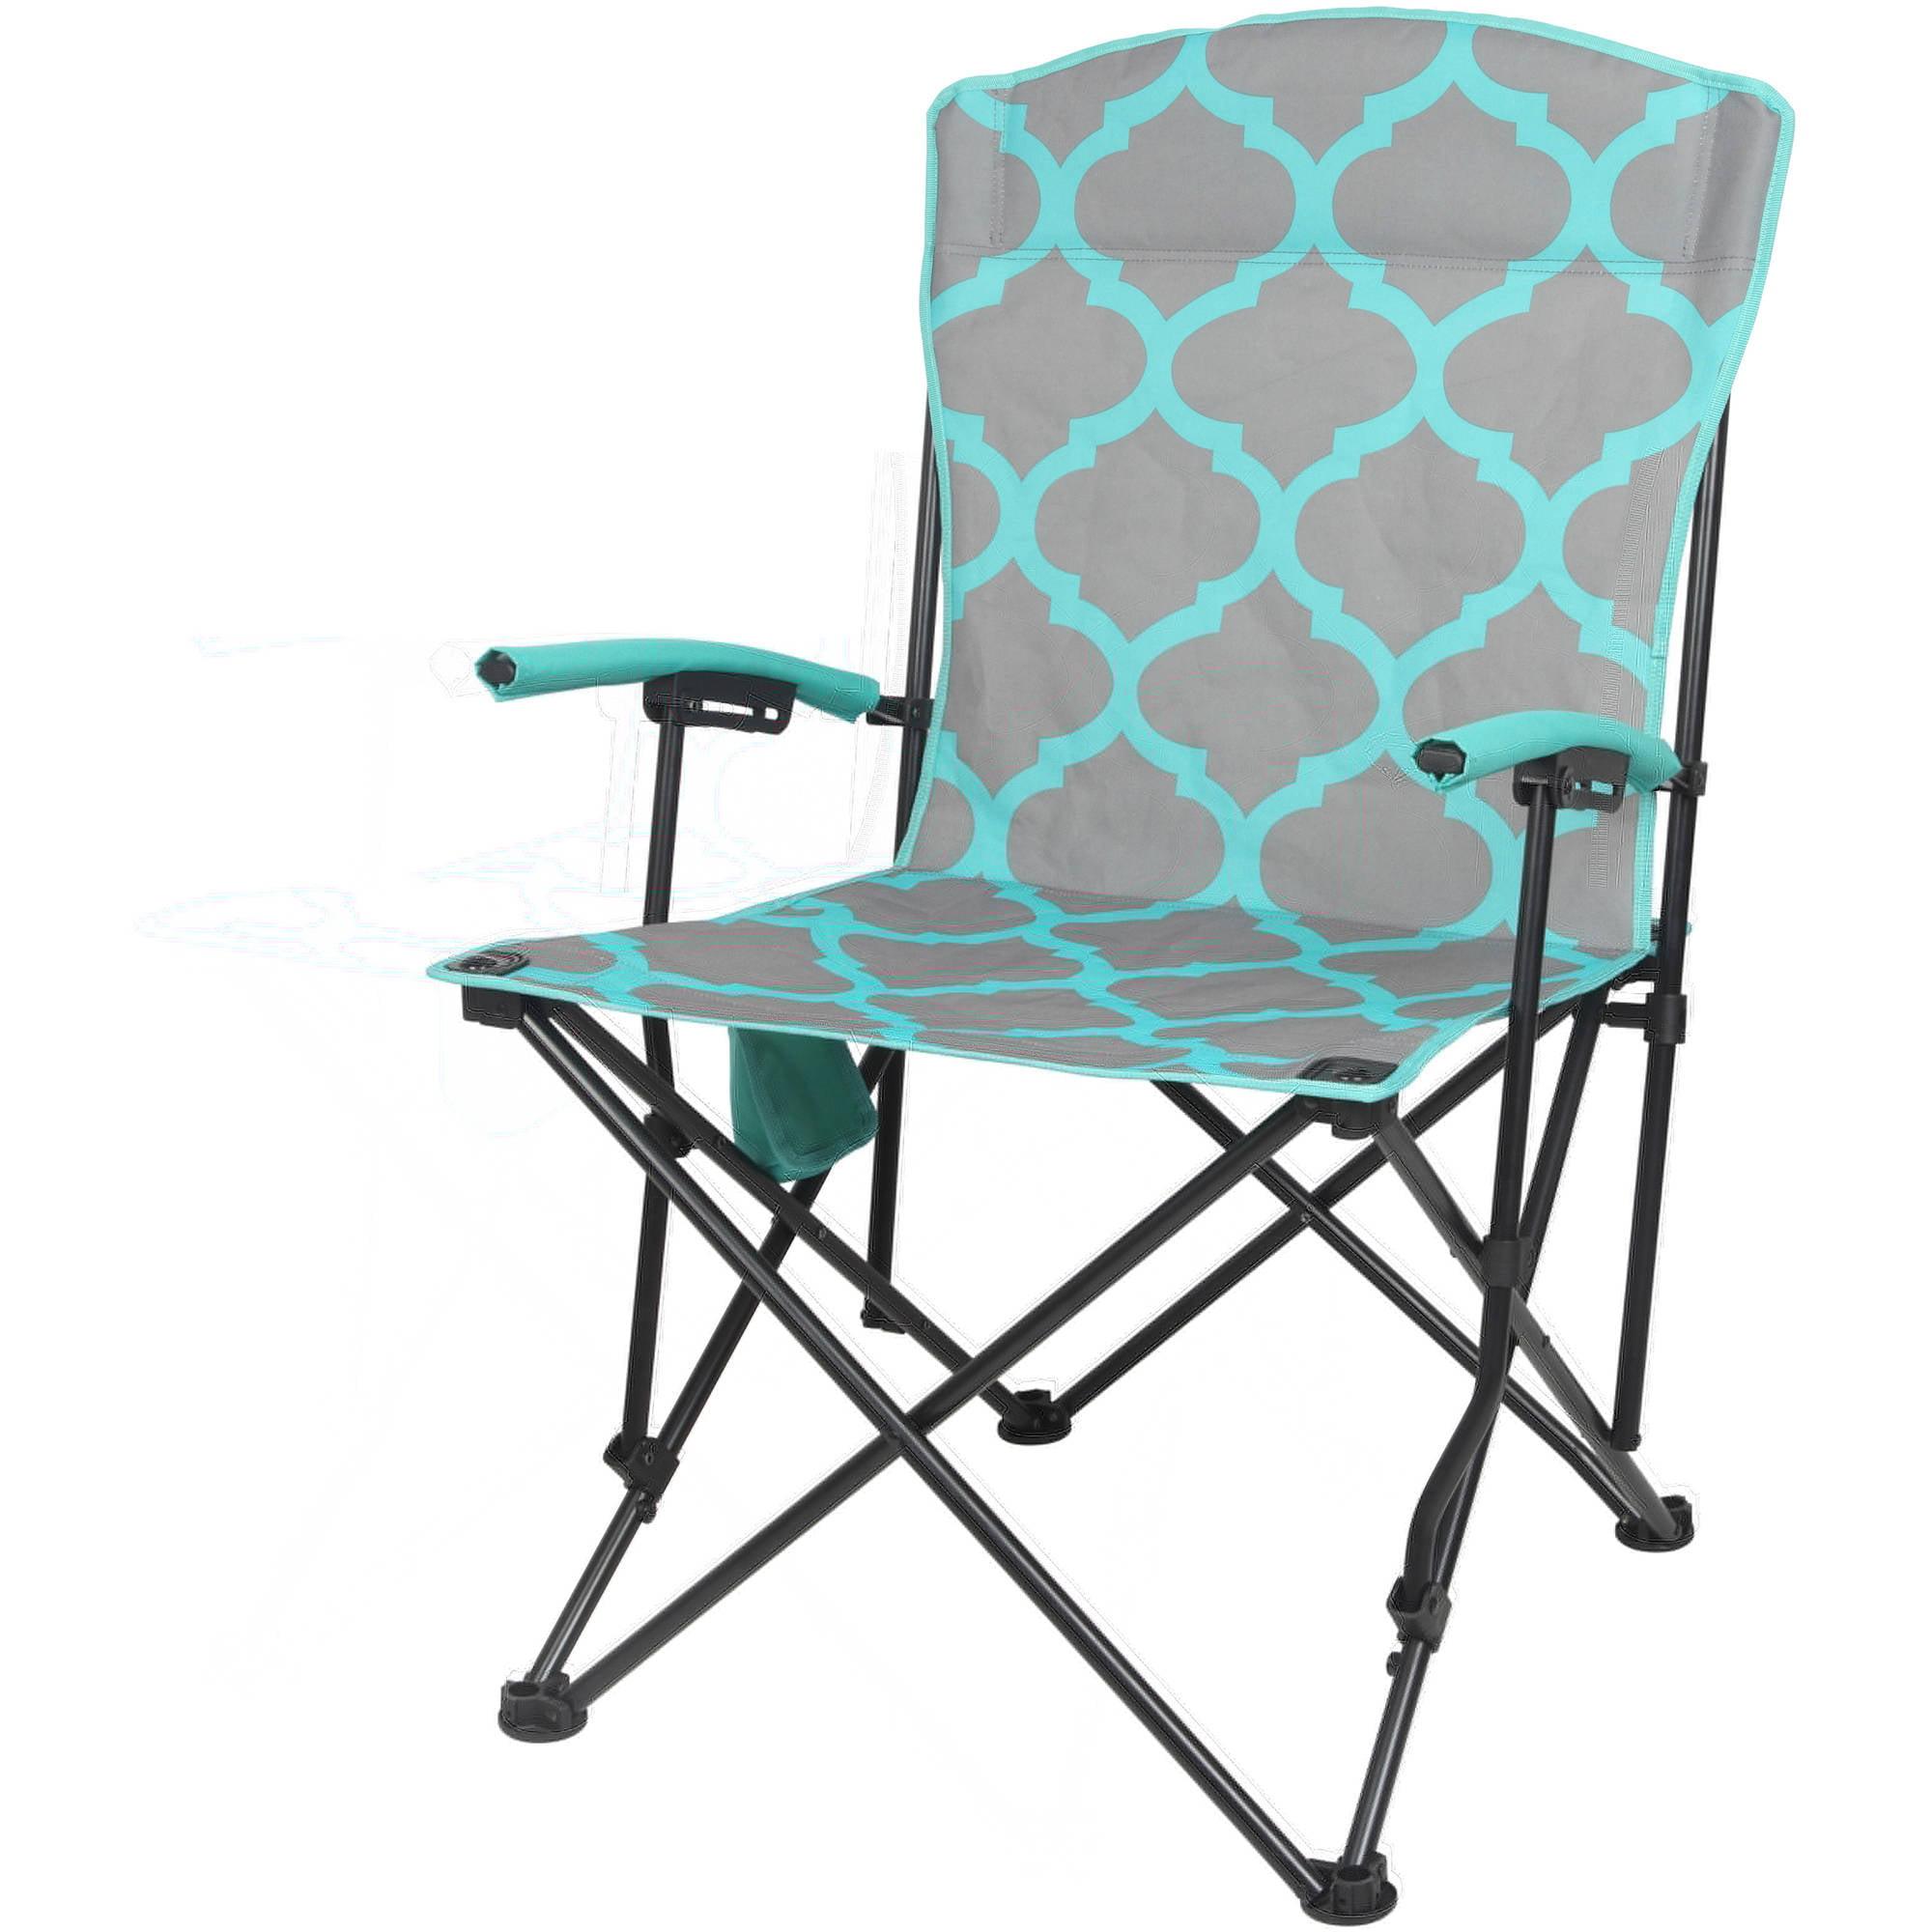 Merveilleux Ozark Trail Basic Hard Arm Chair, Blue   Walmart.com